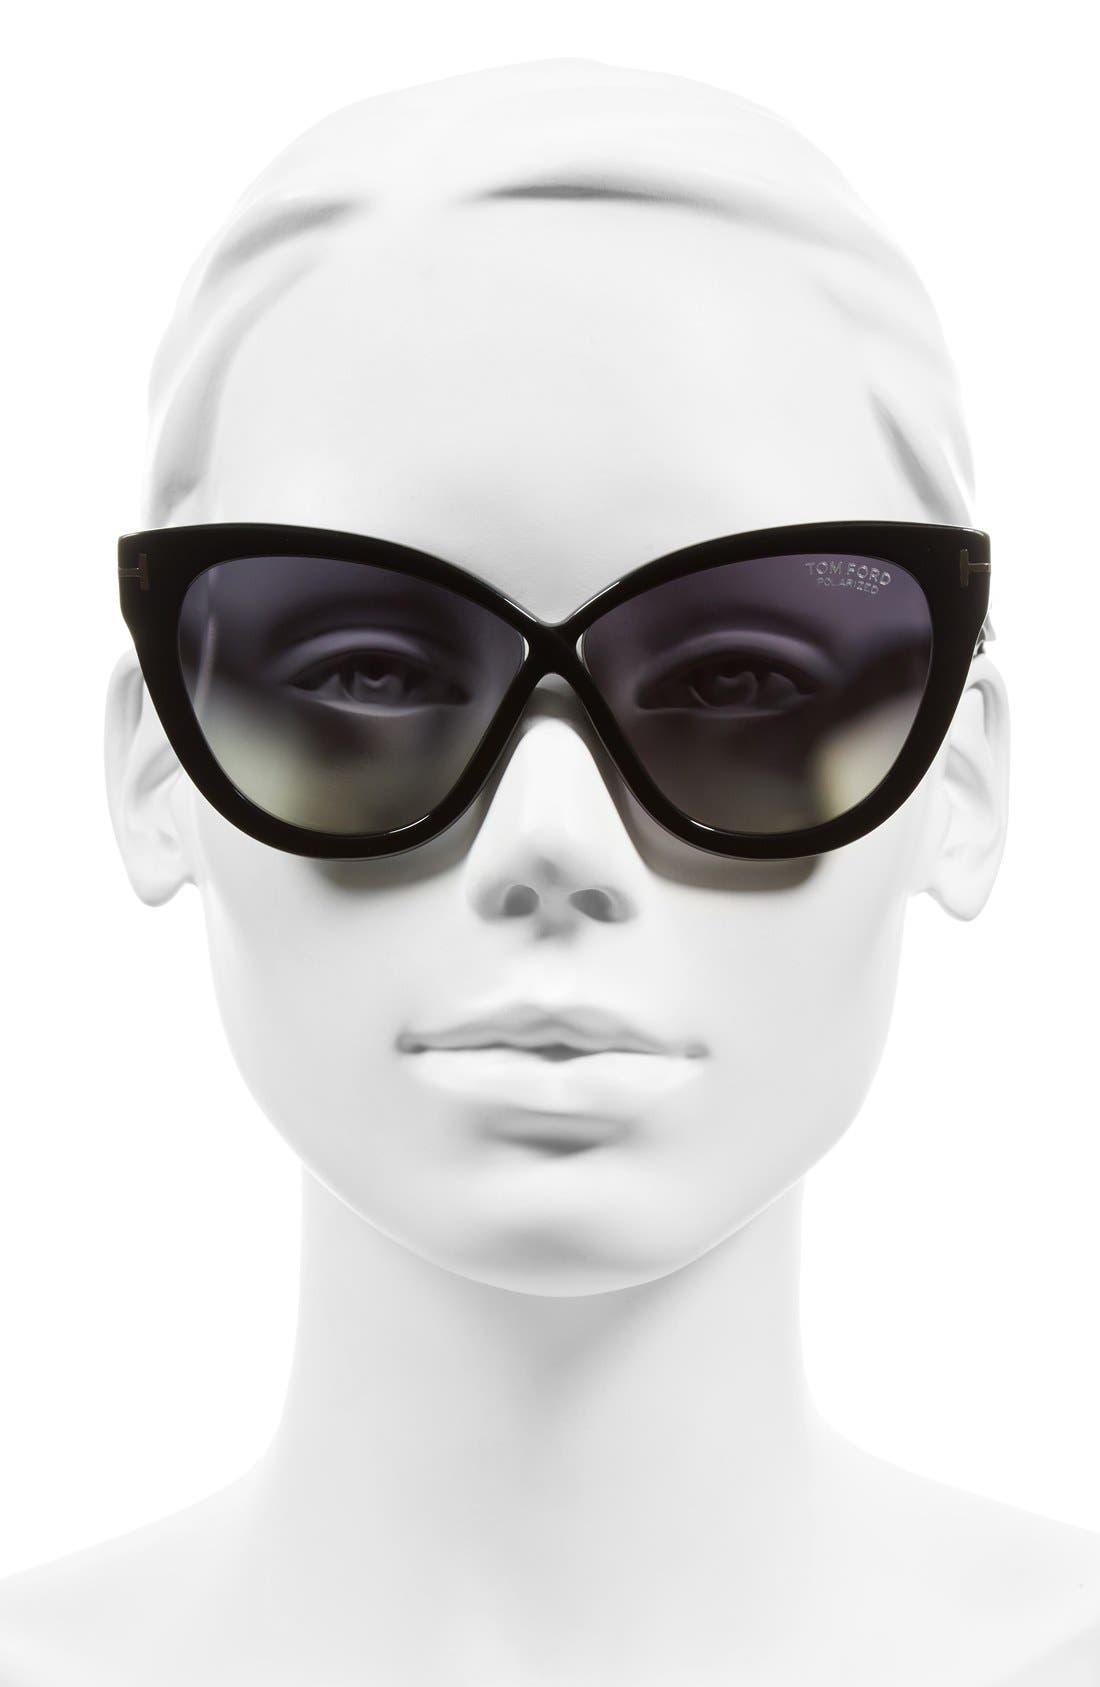 Arabella 59mm Cat Eye Sunglasses,                             Alternate thumbnail 2, color,                             Black/ Polar Gradient Smoke